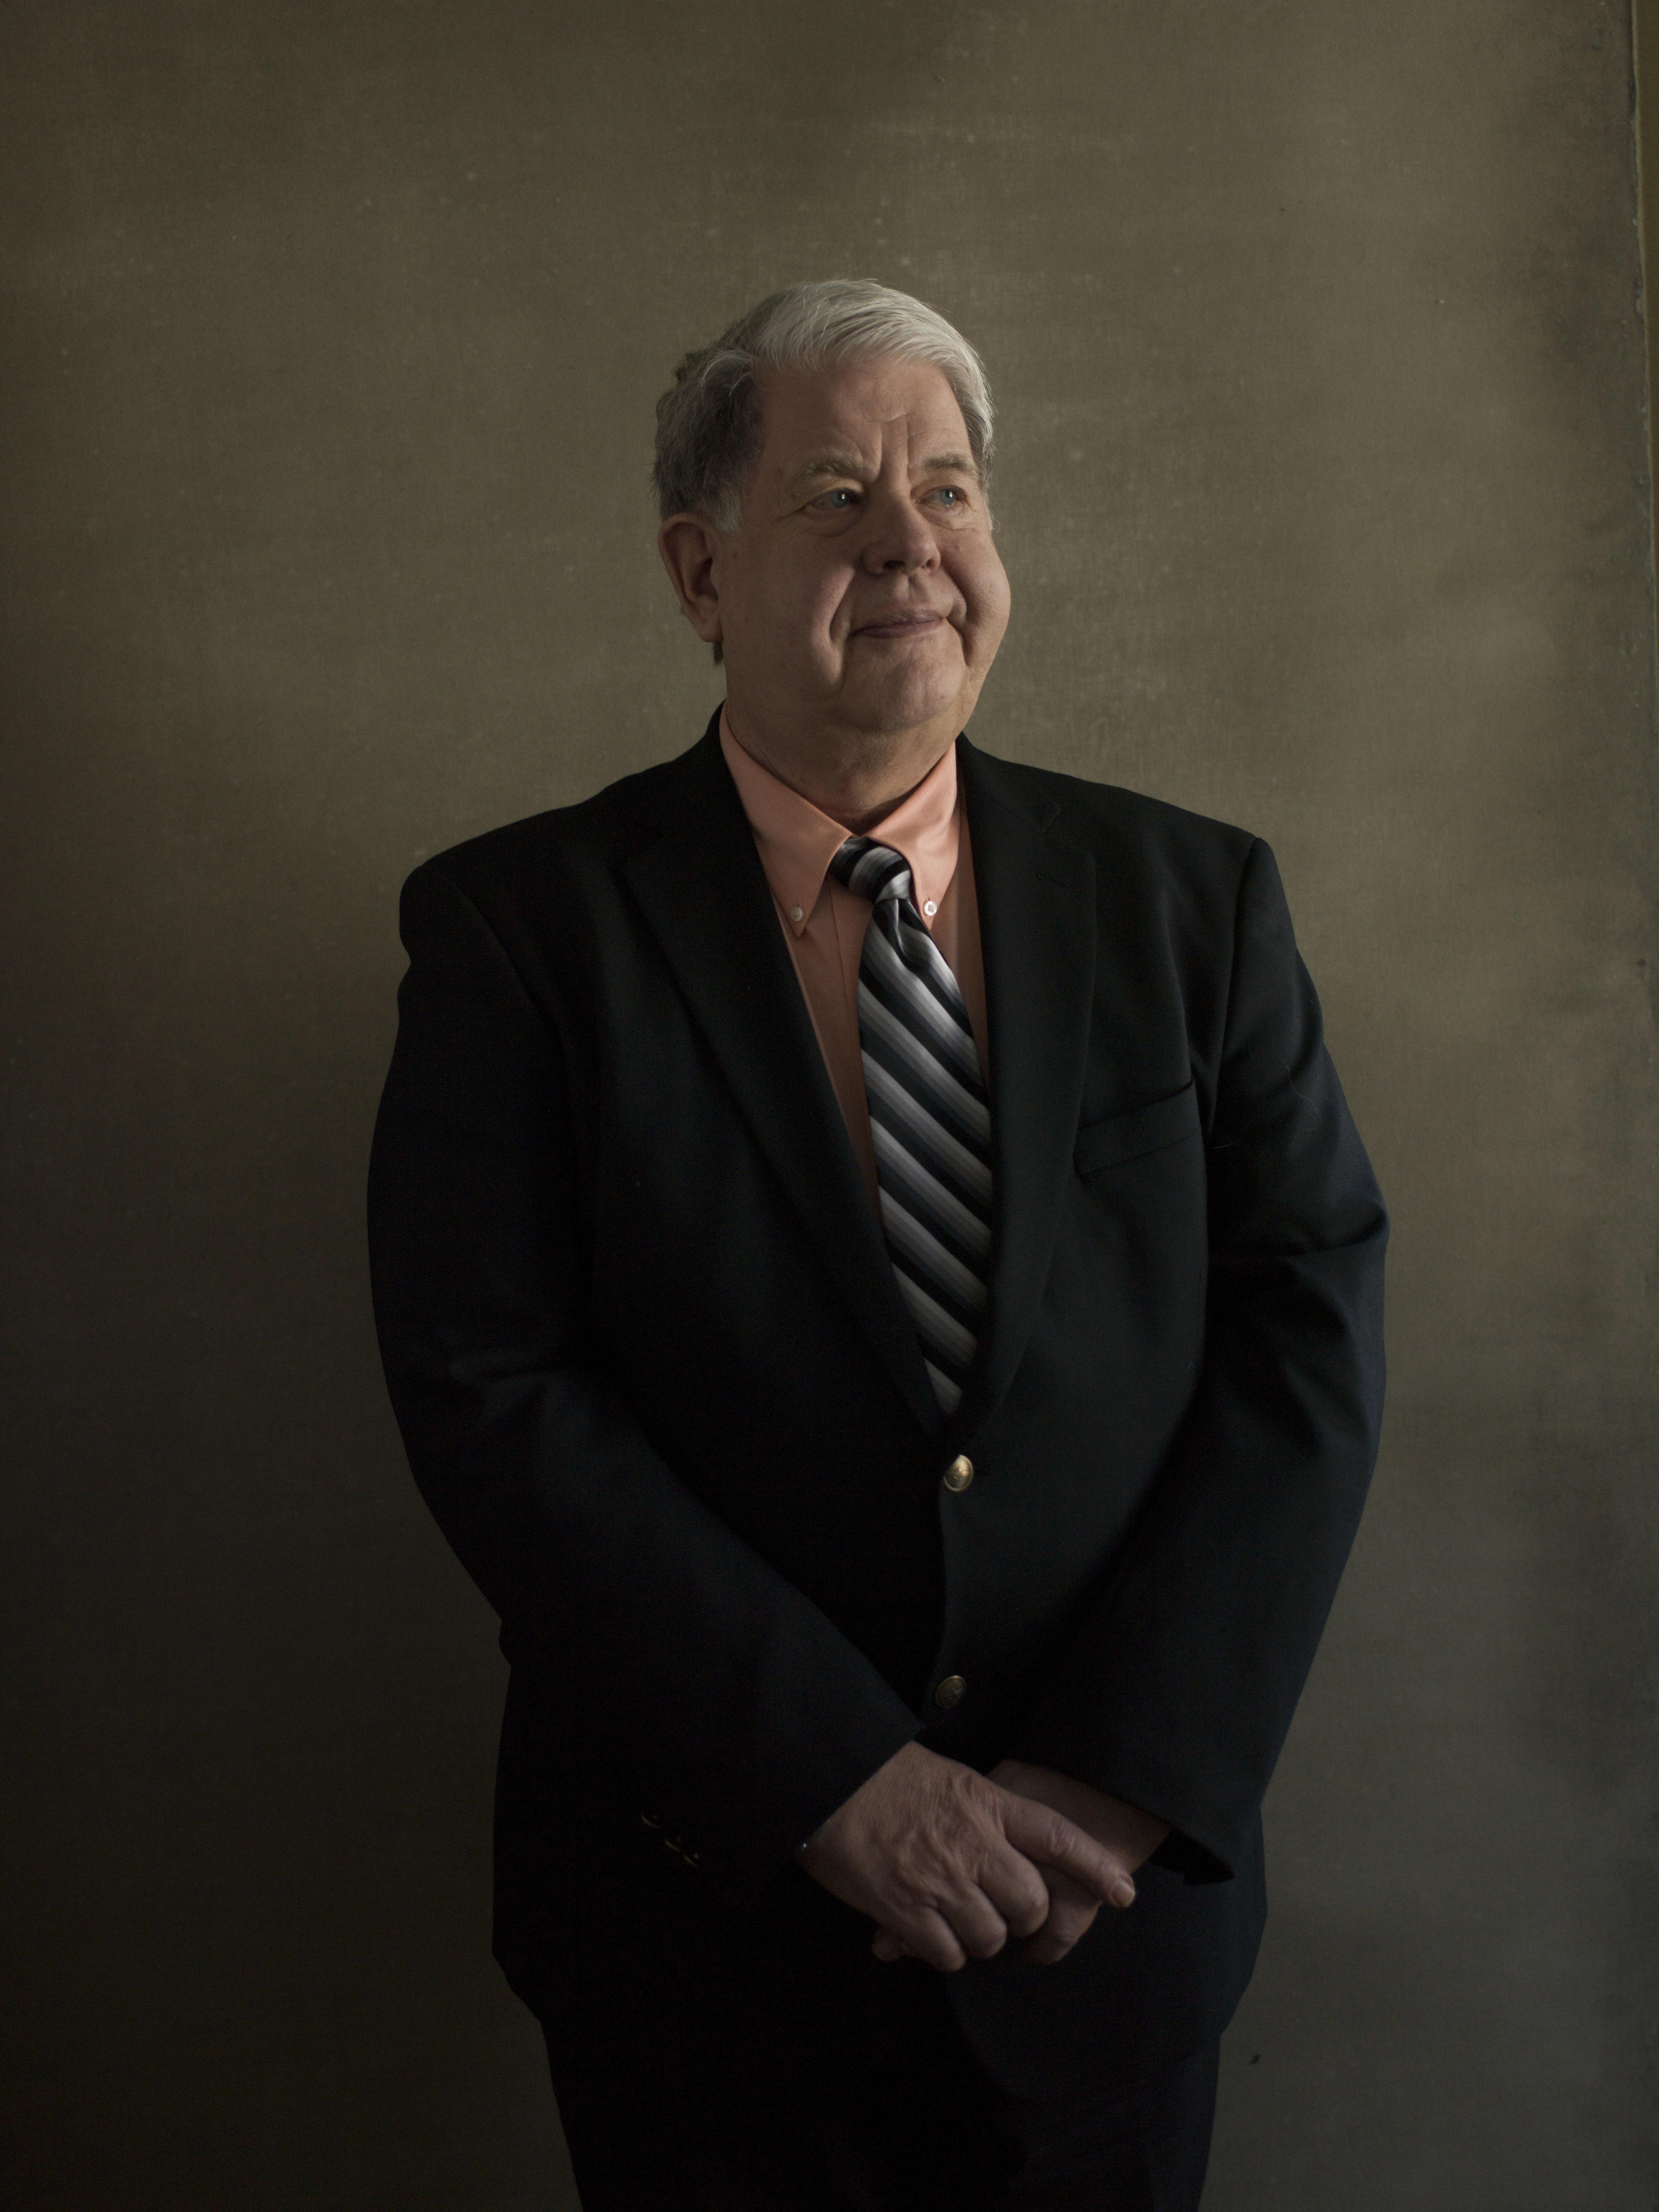 LeRoy Carhart, o médico que se arrisca ao realizar abortos nos Estados